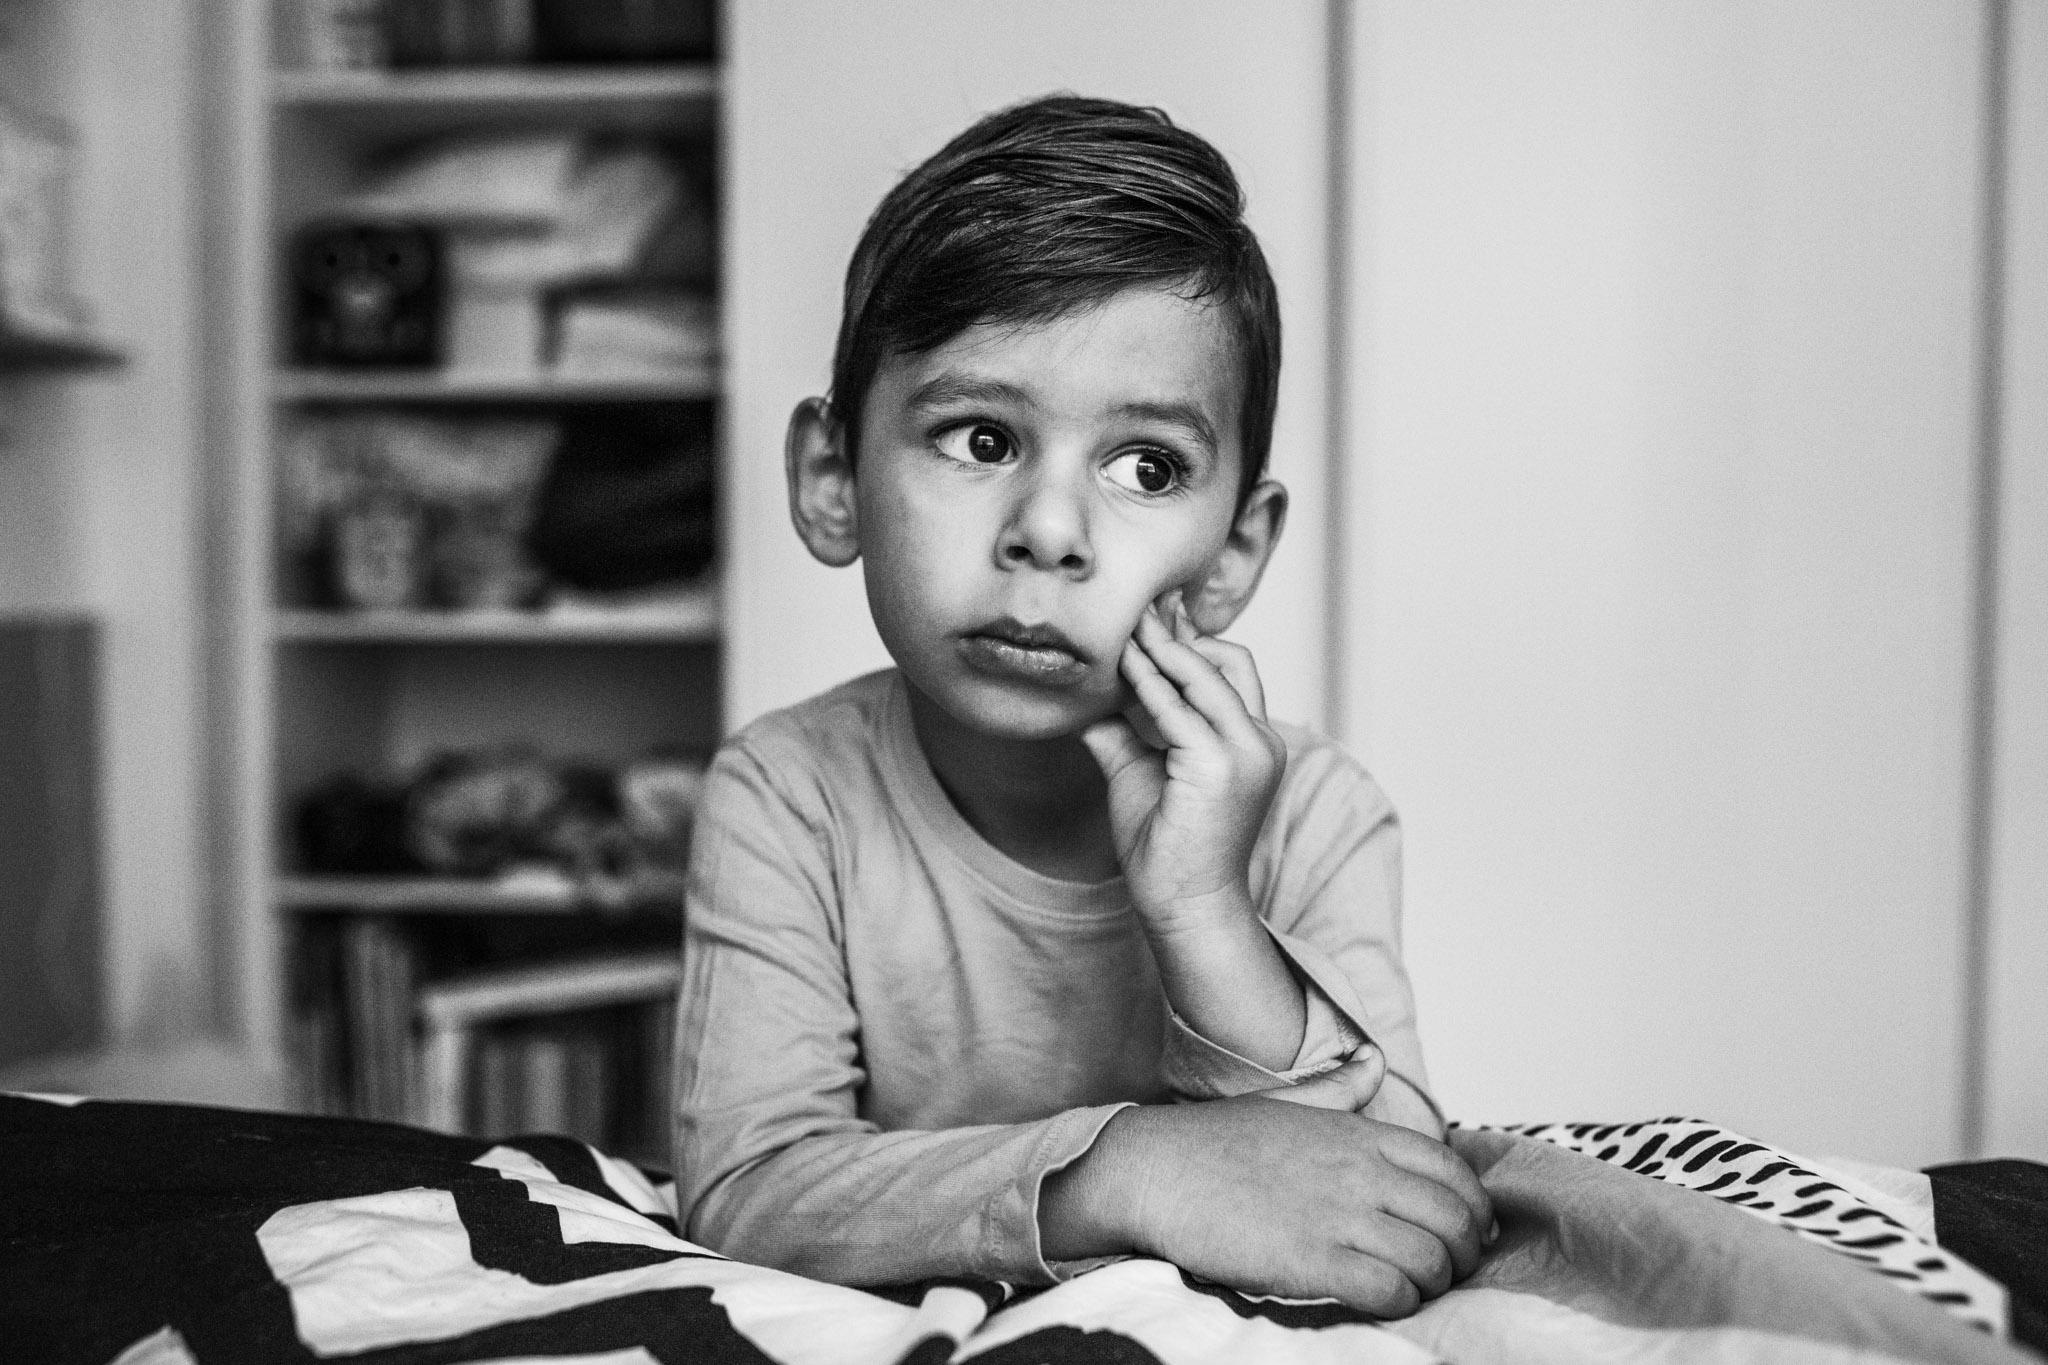 litle boy in his bedroom BW (1 of 1).jpg